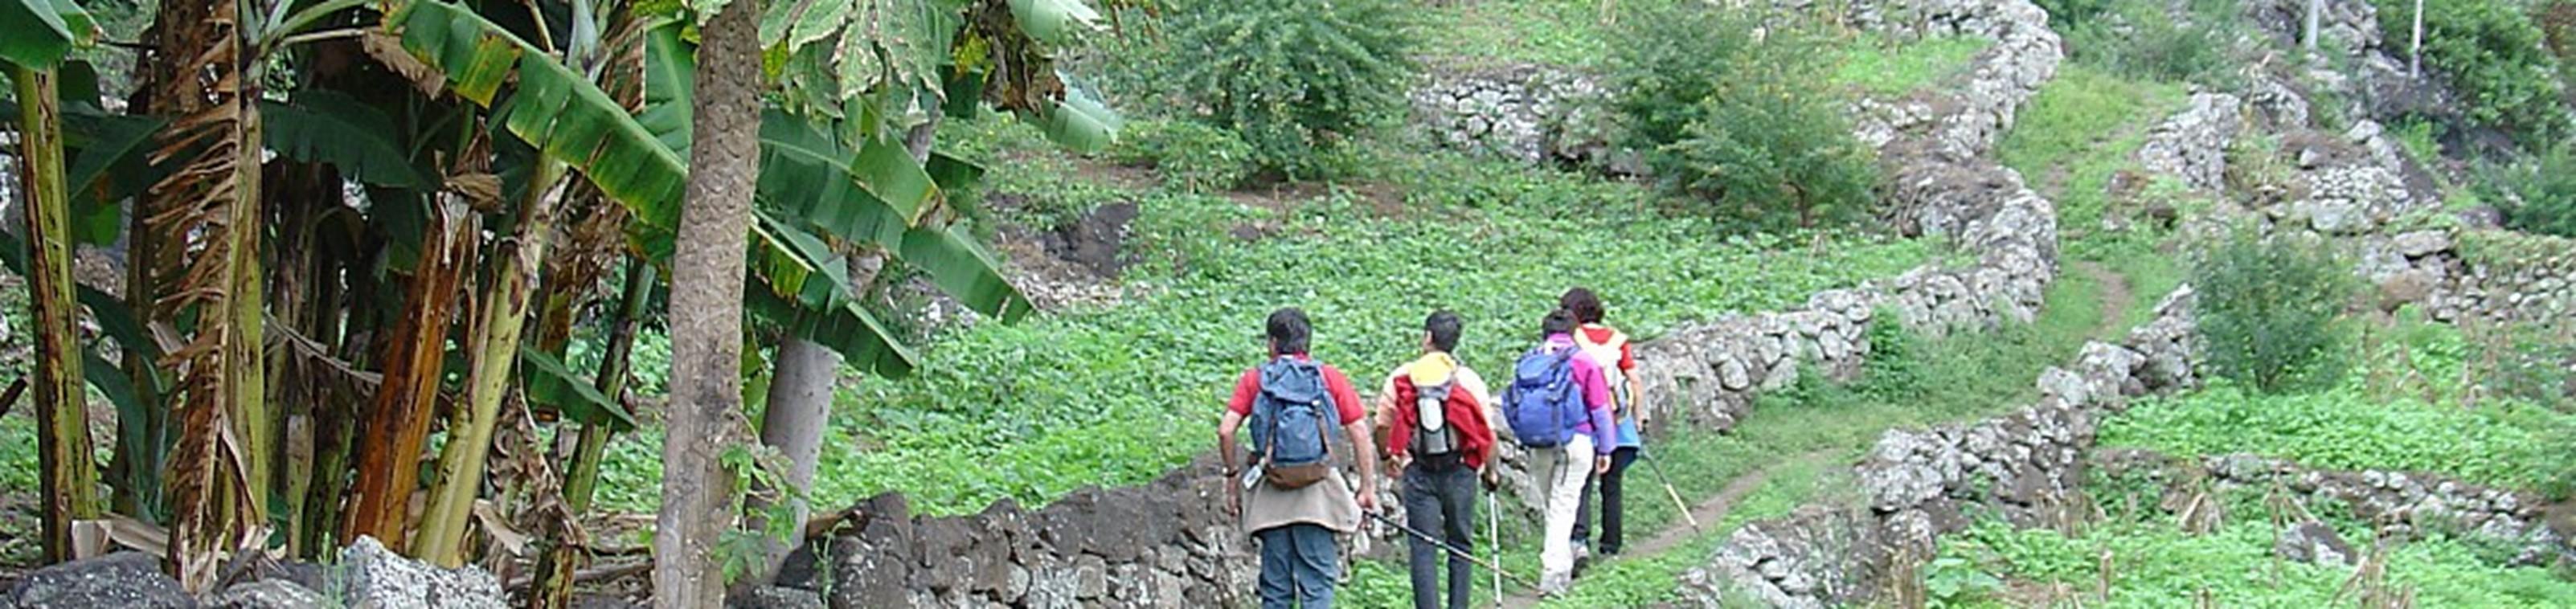 Al wandelend doorheen São Vicente en Santo Antão